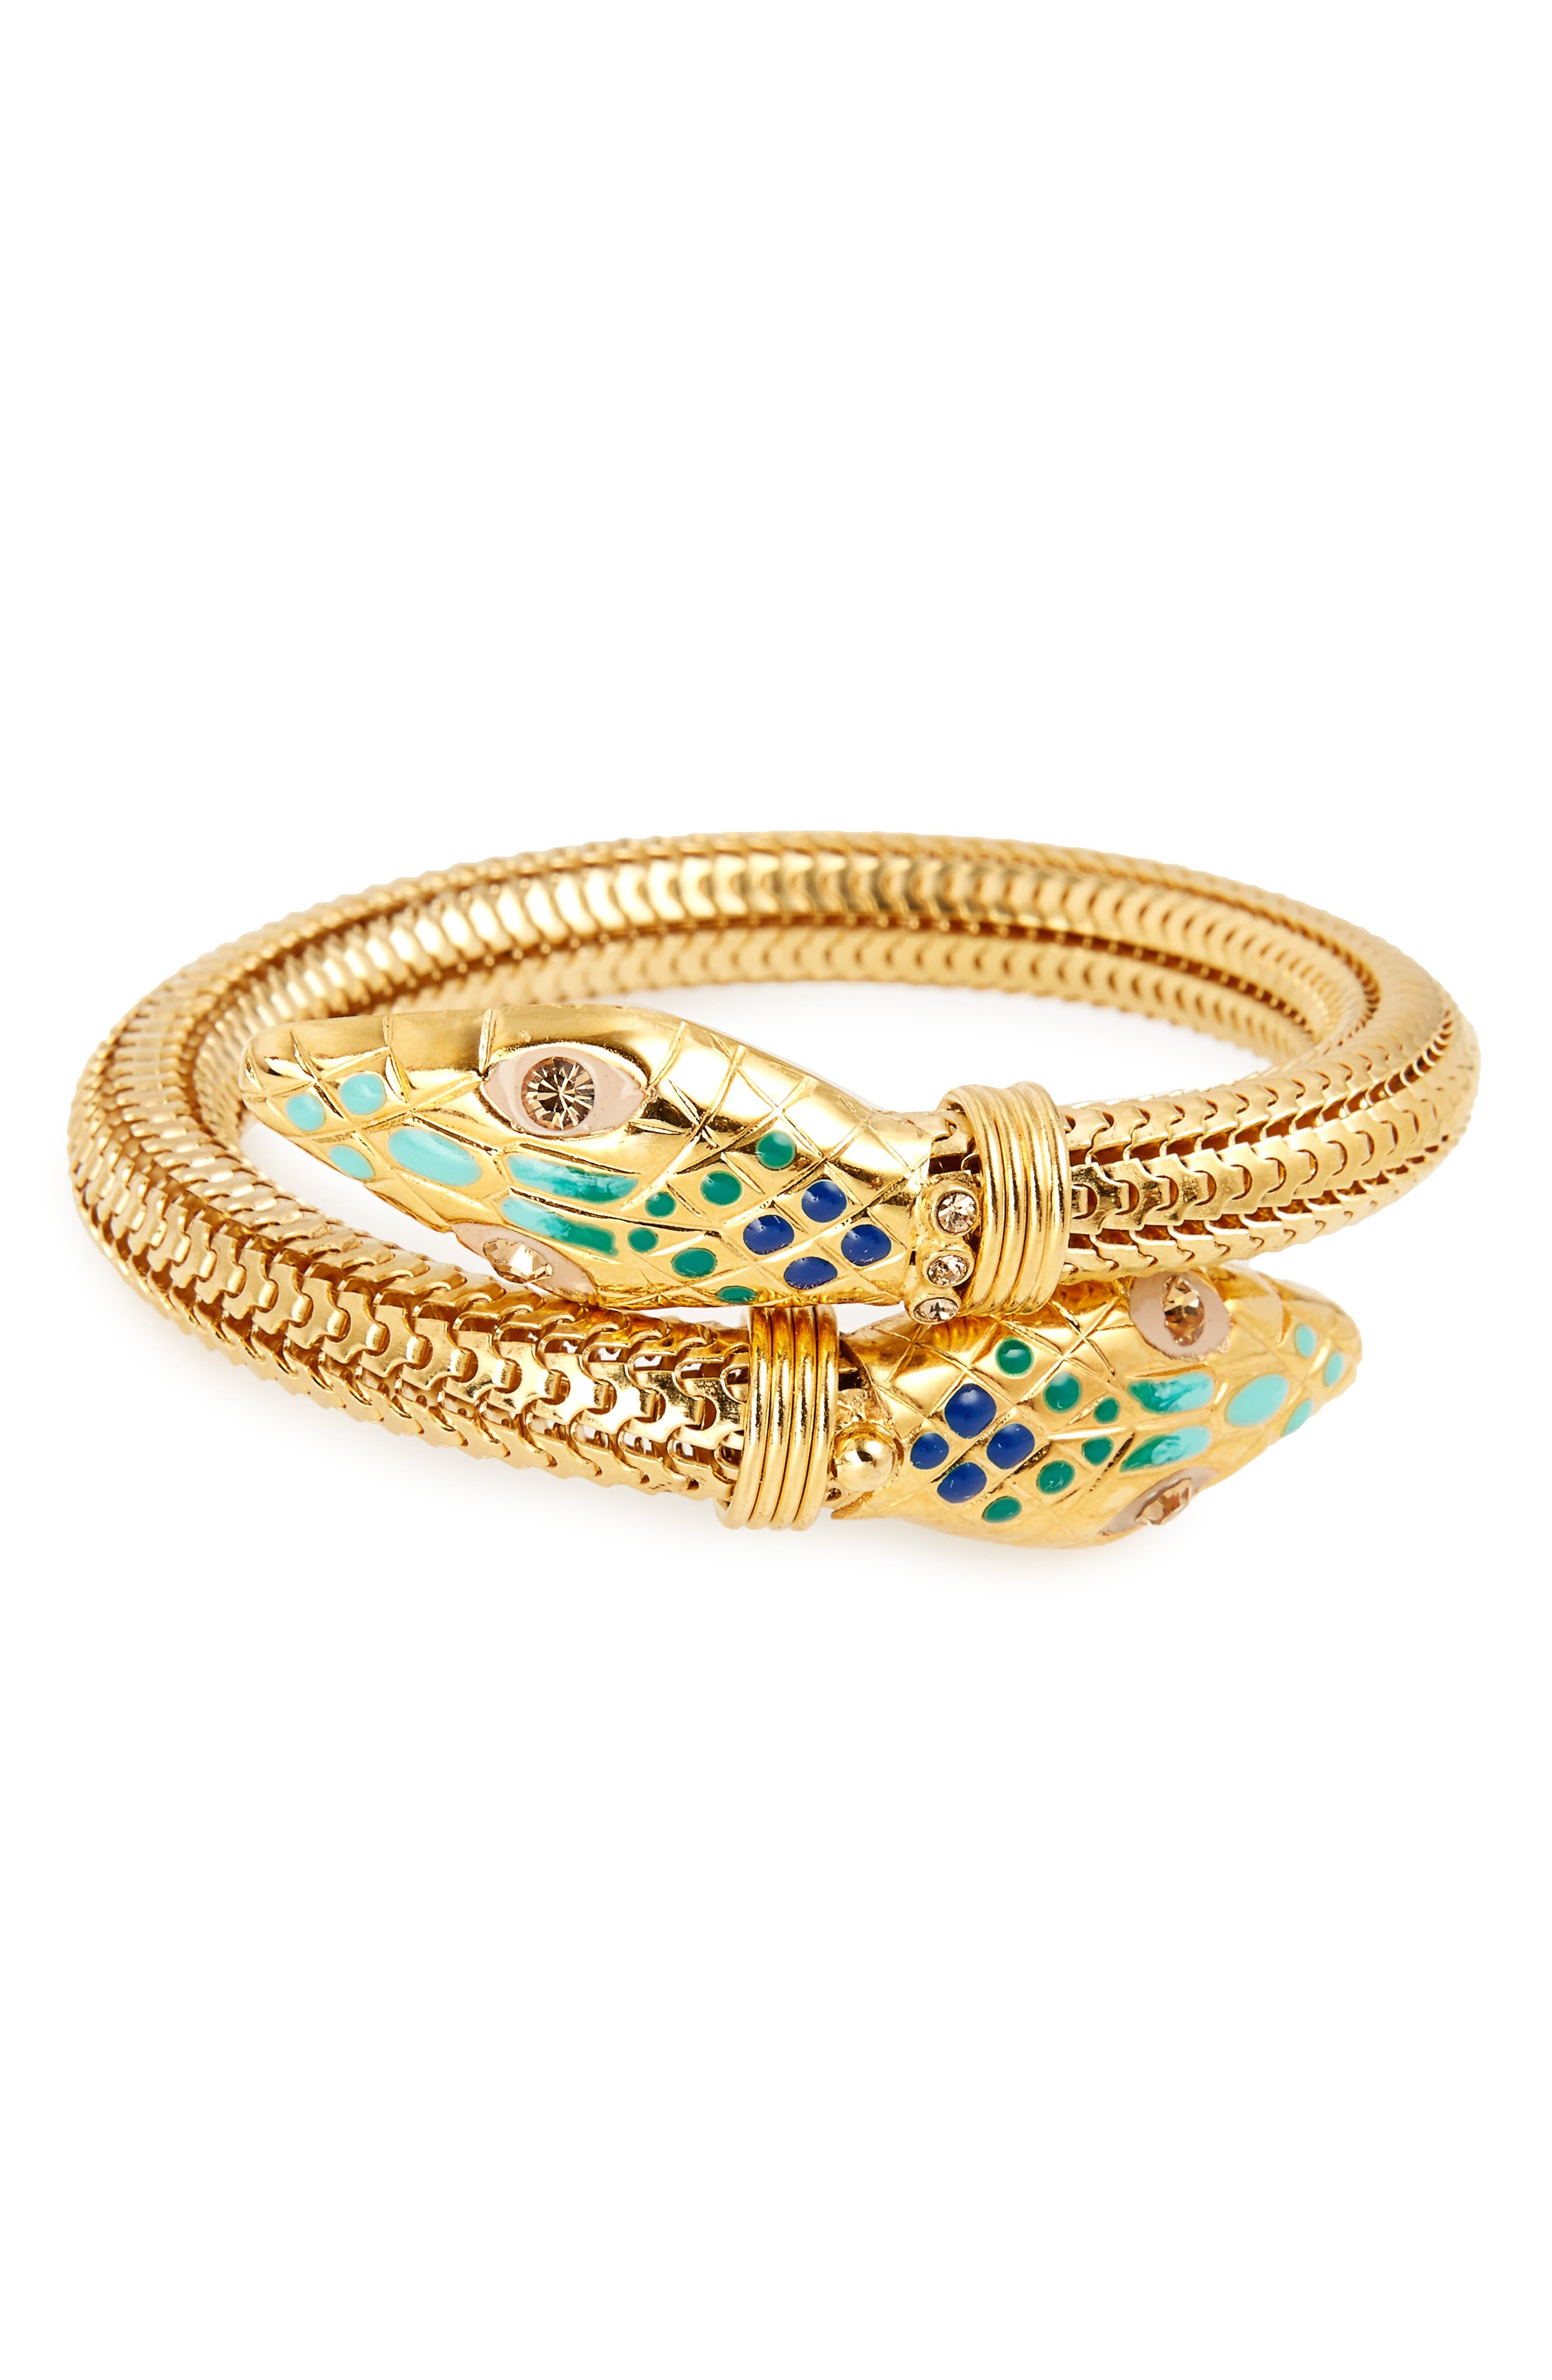 'Cobra' Enameled Bracelet,                             Main thumbnail 1, color,                             Blue Turquoise/ Gold